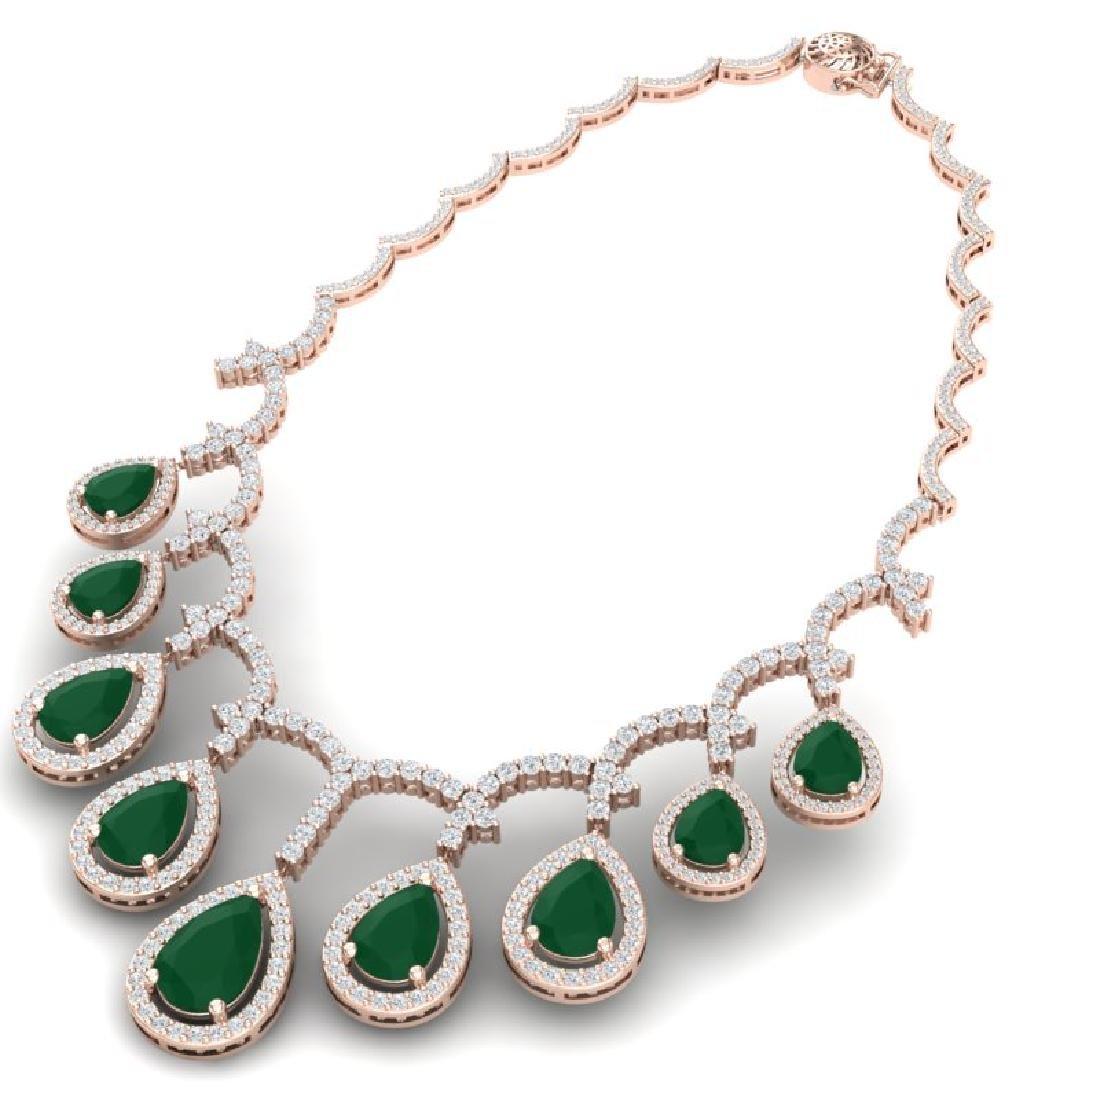 31.5 CTW Royalty Emerald & VS Diamond Necklace 18K Rose - 3